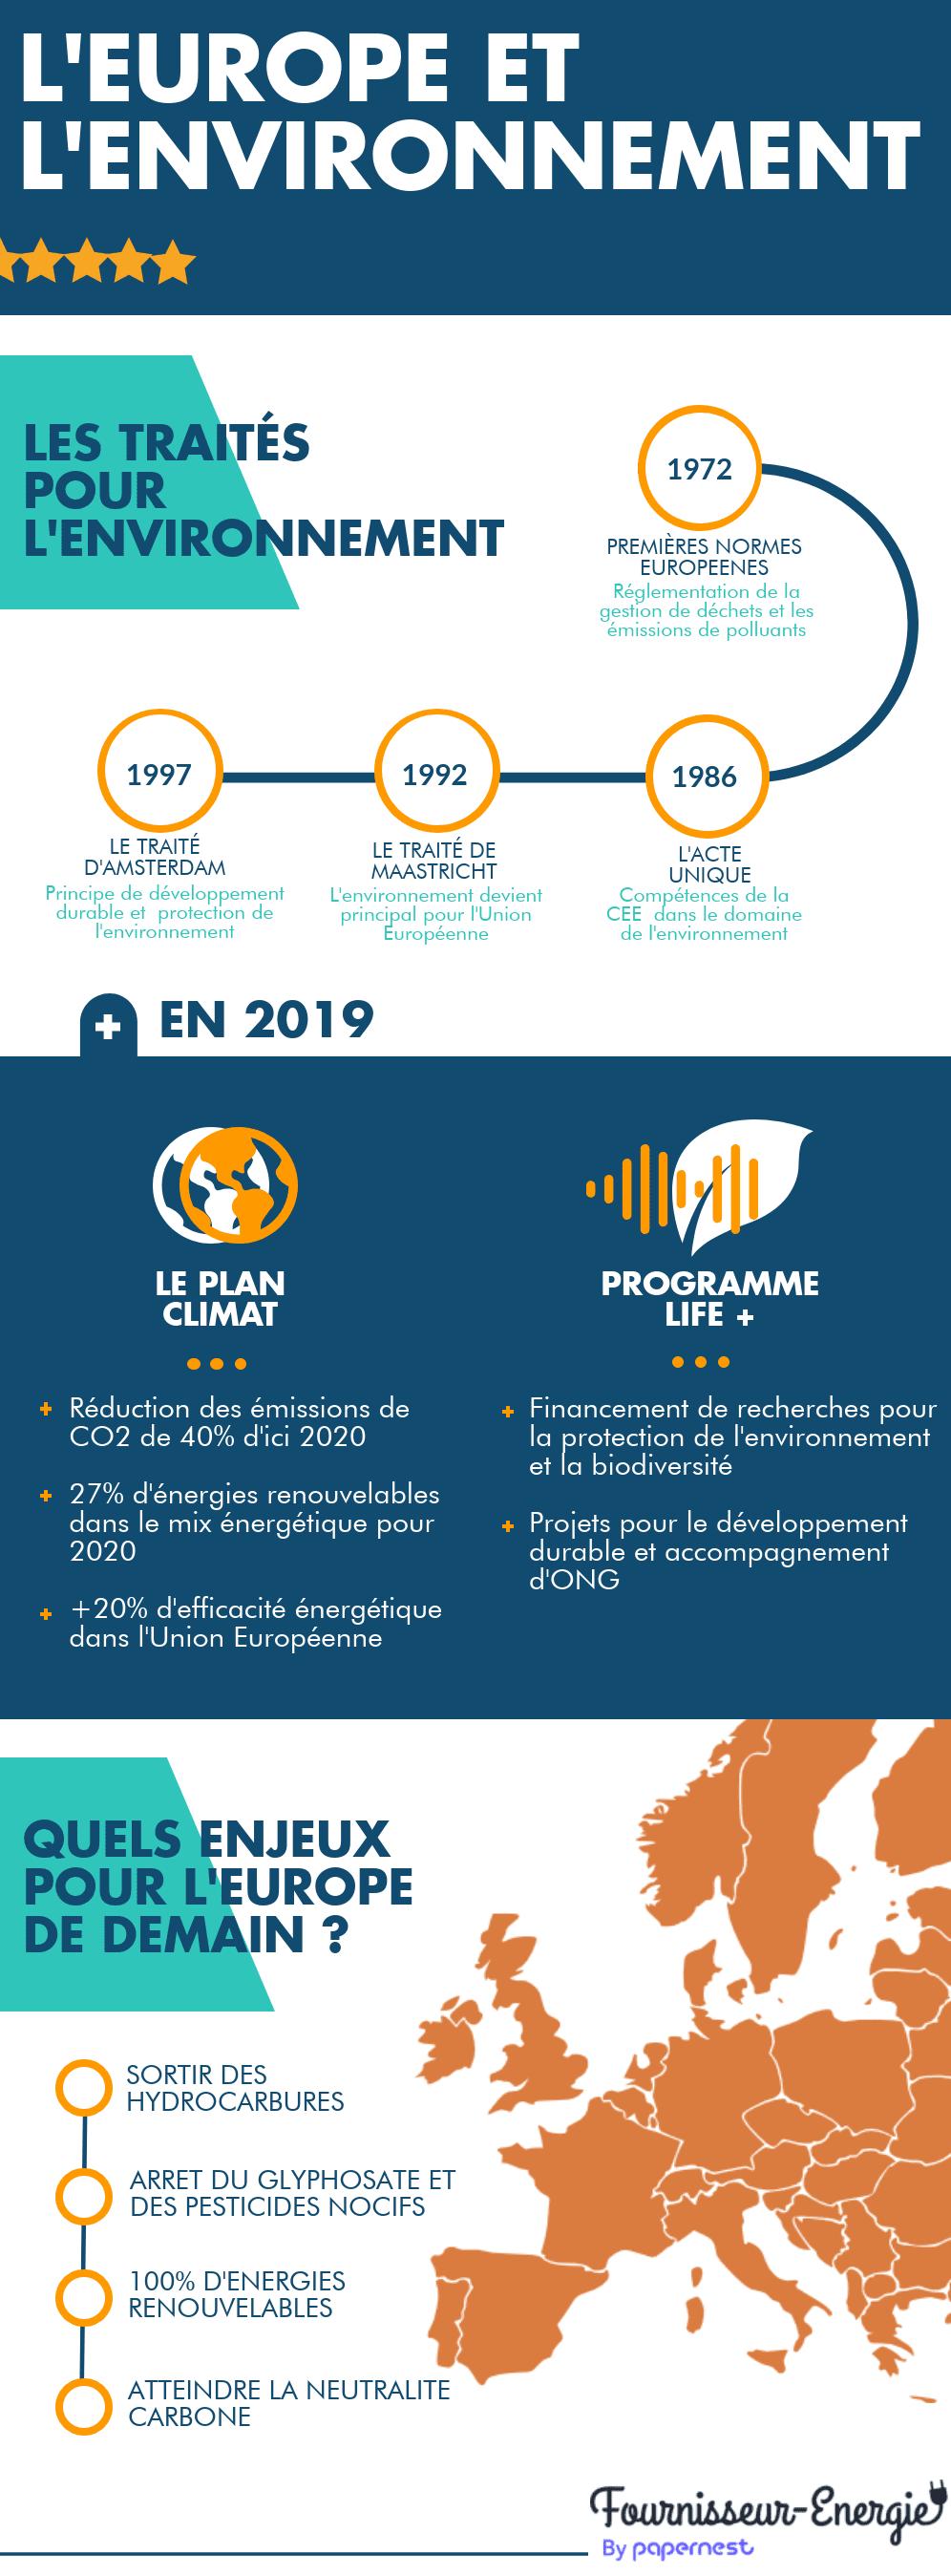 europe et environnement